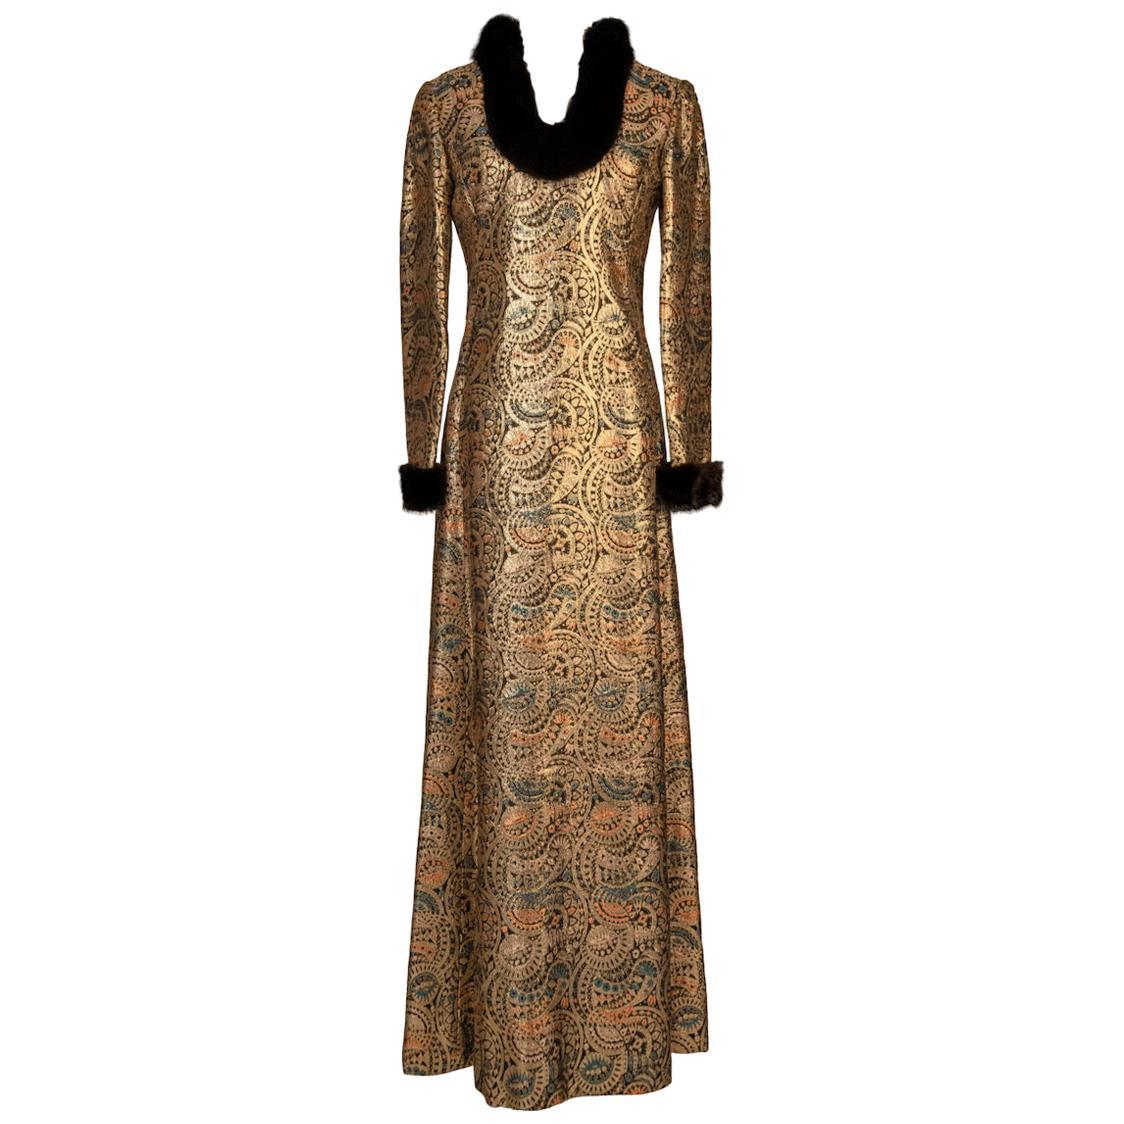 Oscar de la Renta Gold Metallic Brocade Sable Trim Evening Dress, c. Fall 1970